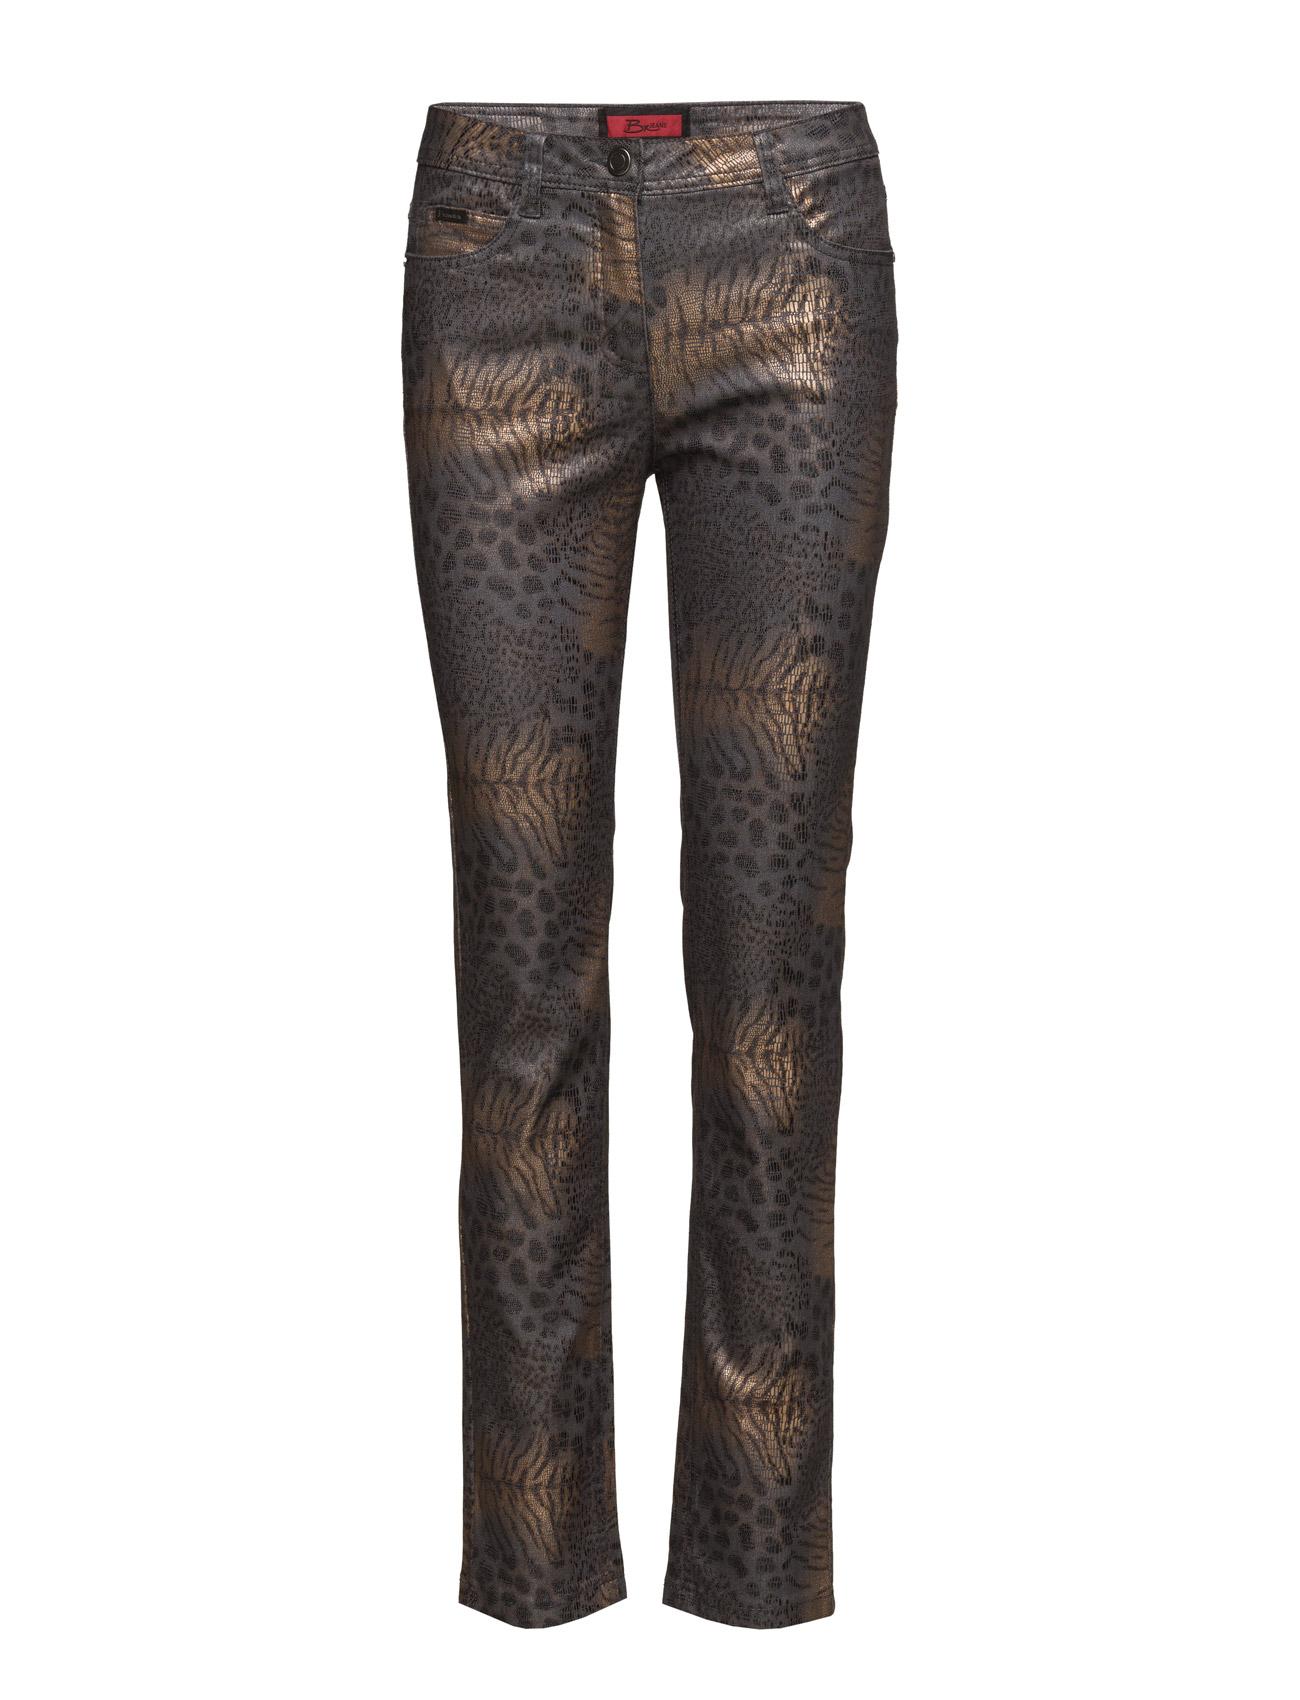 Jeans Brandtex Bukser til Kvinder i Grå